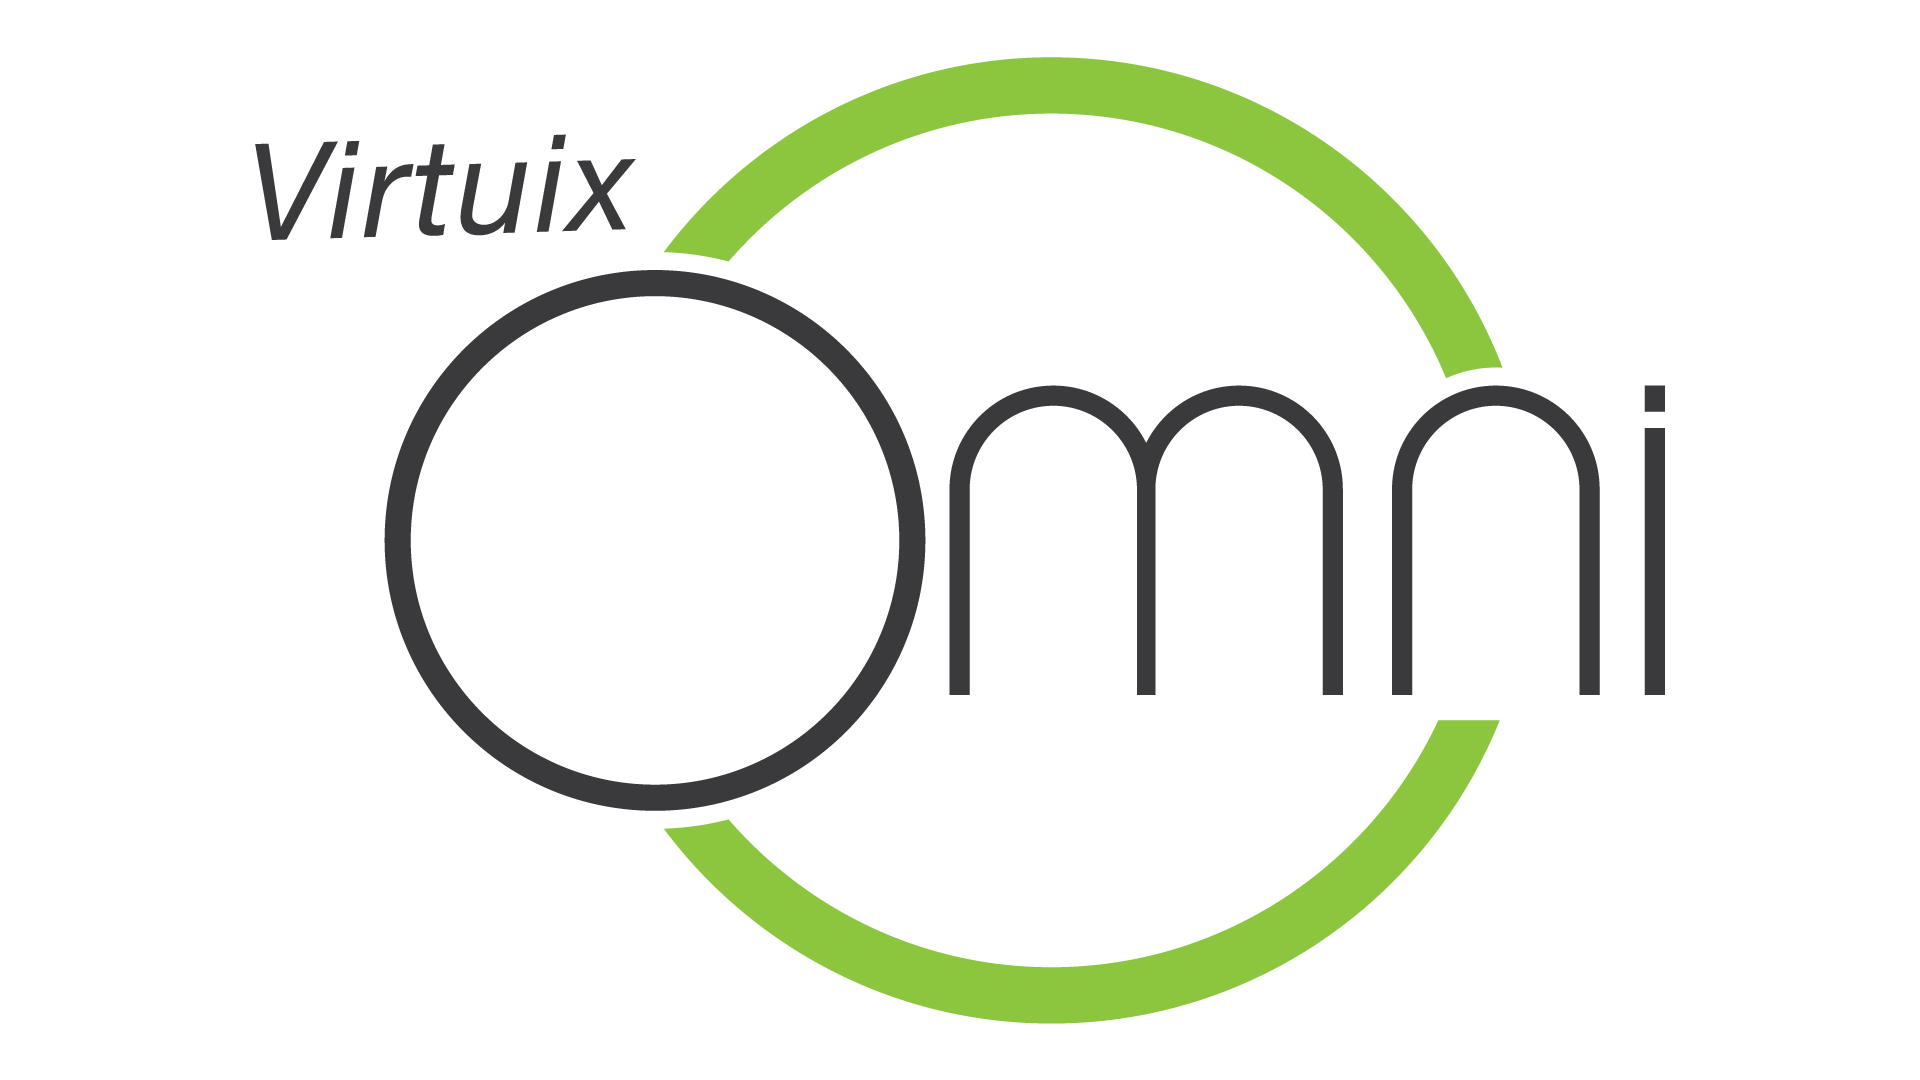 Virtuix-Omni-Logo.png